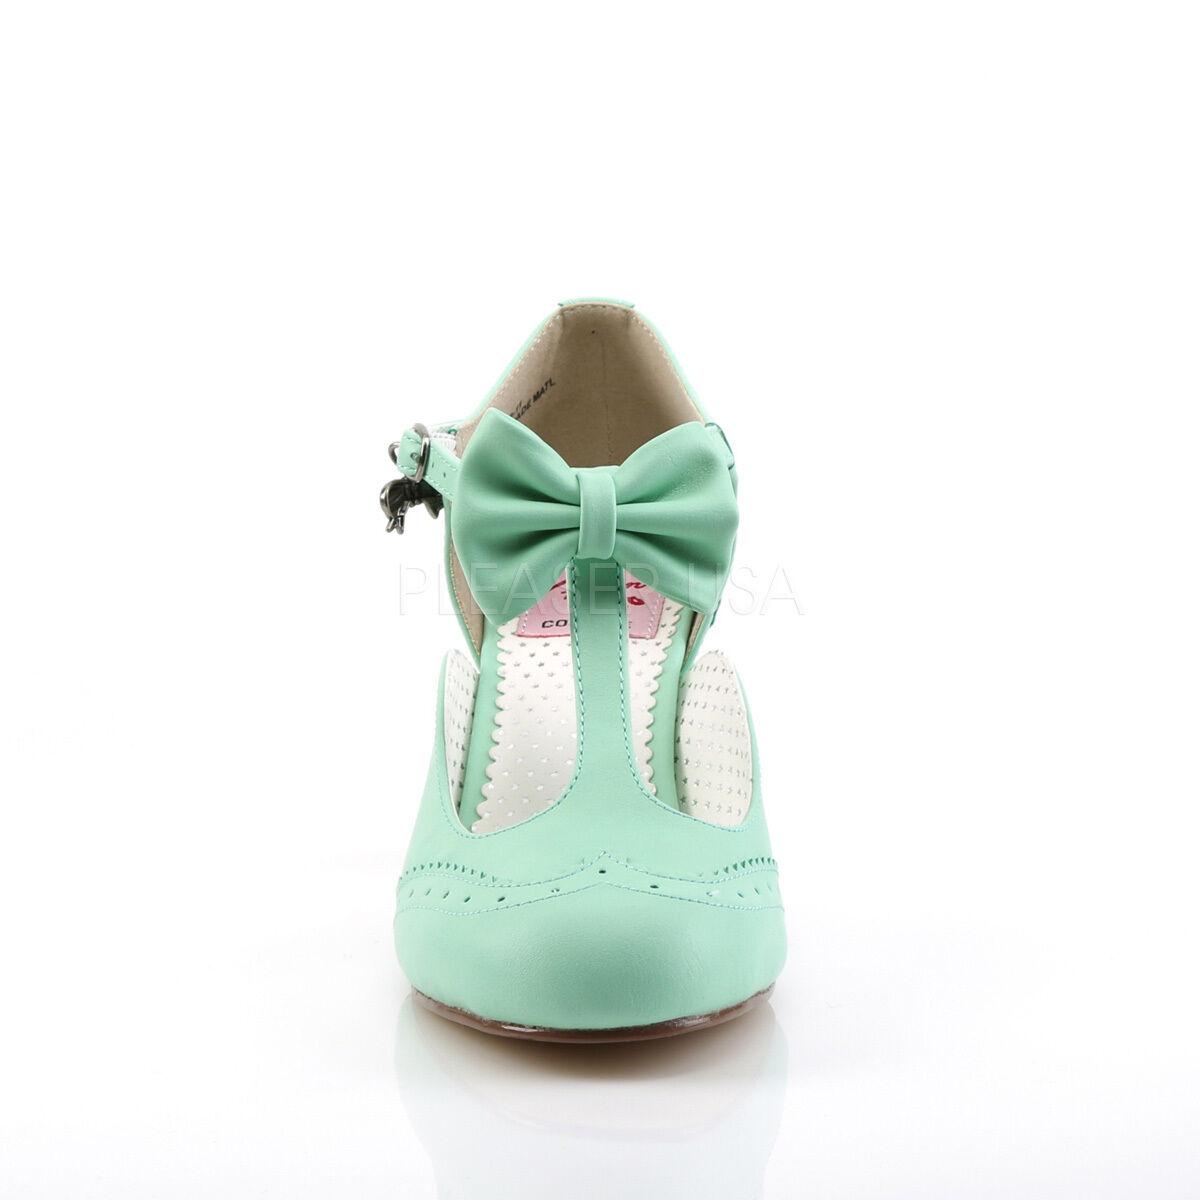 "Sexy 3"" Kitten Heel Round Toe Wingtip T-Strap Mint Green Pumps Shoes FLAP11/MTPU 1"